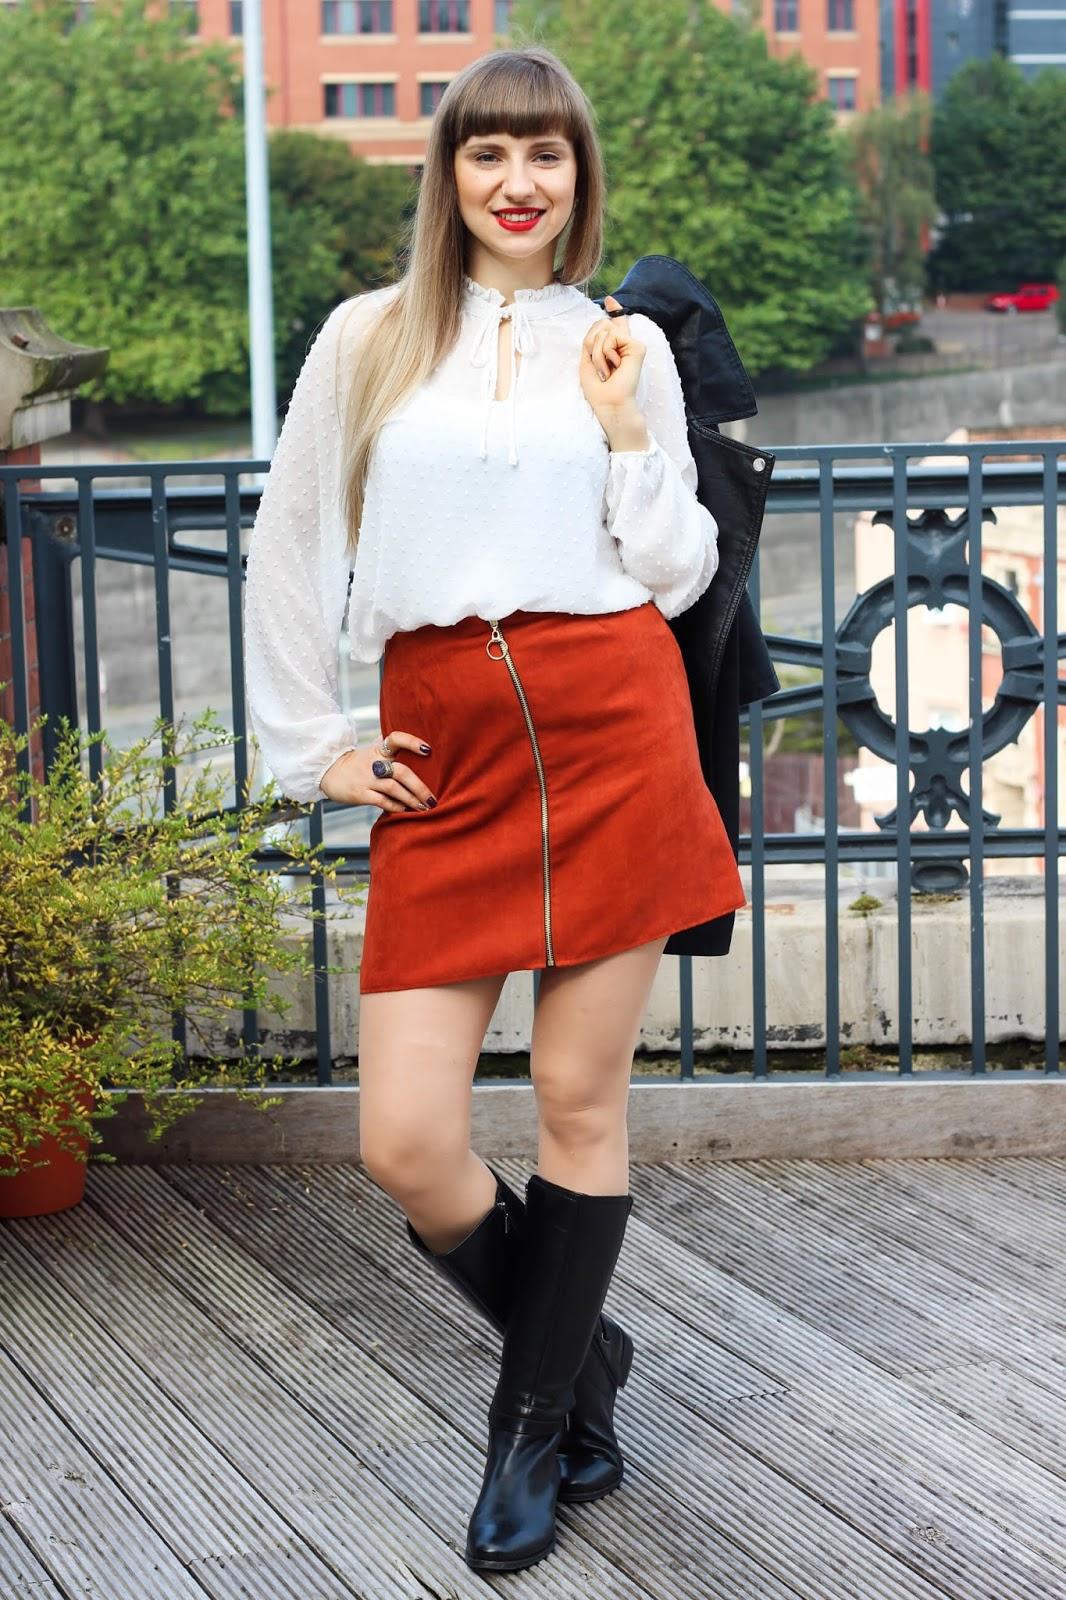 Leeds Lifestyle and Fashion Blogger